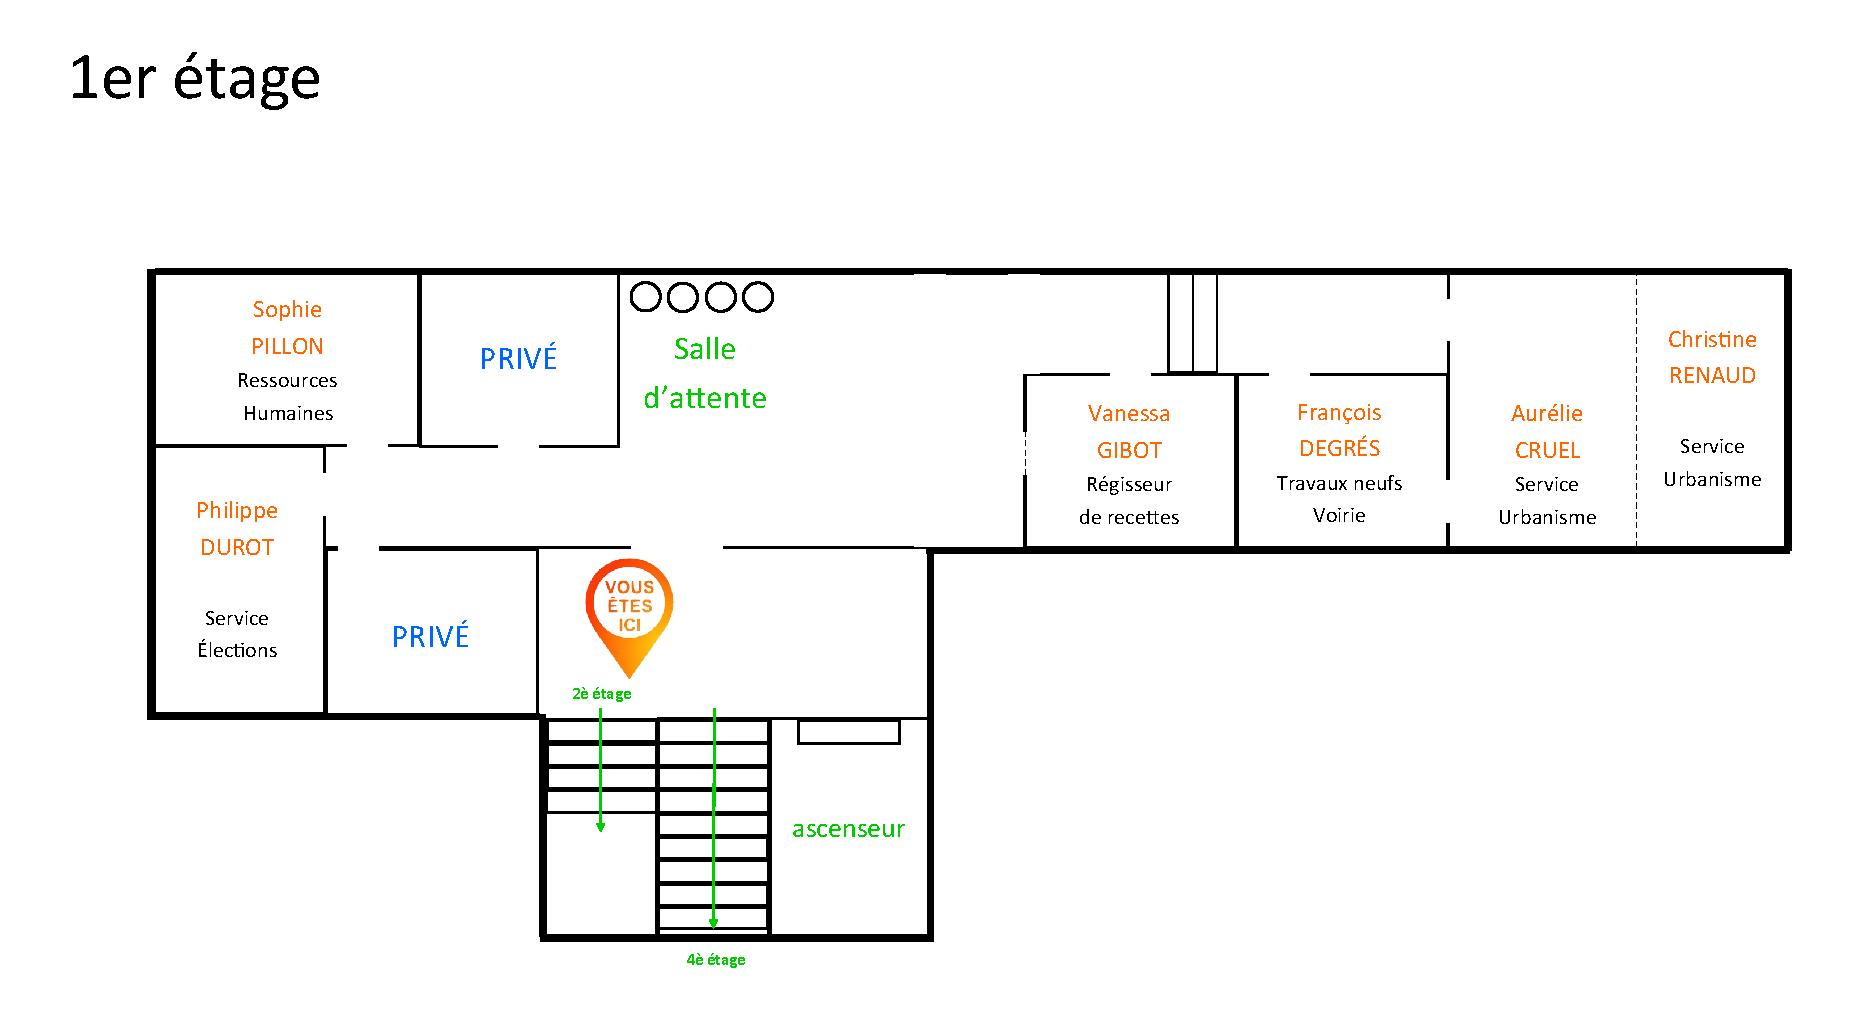 1er_etage.png